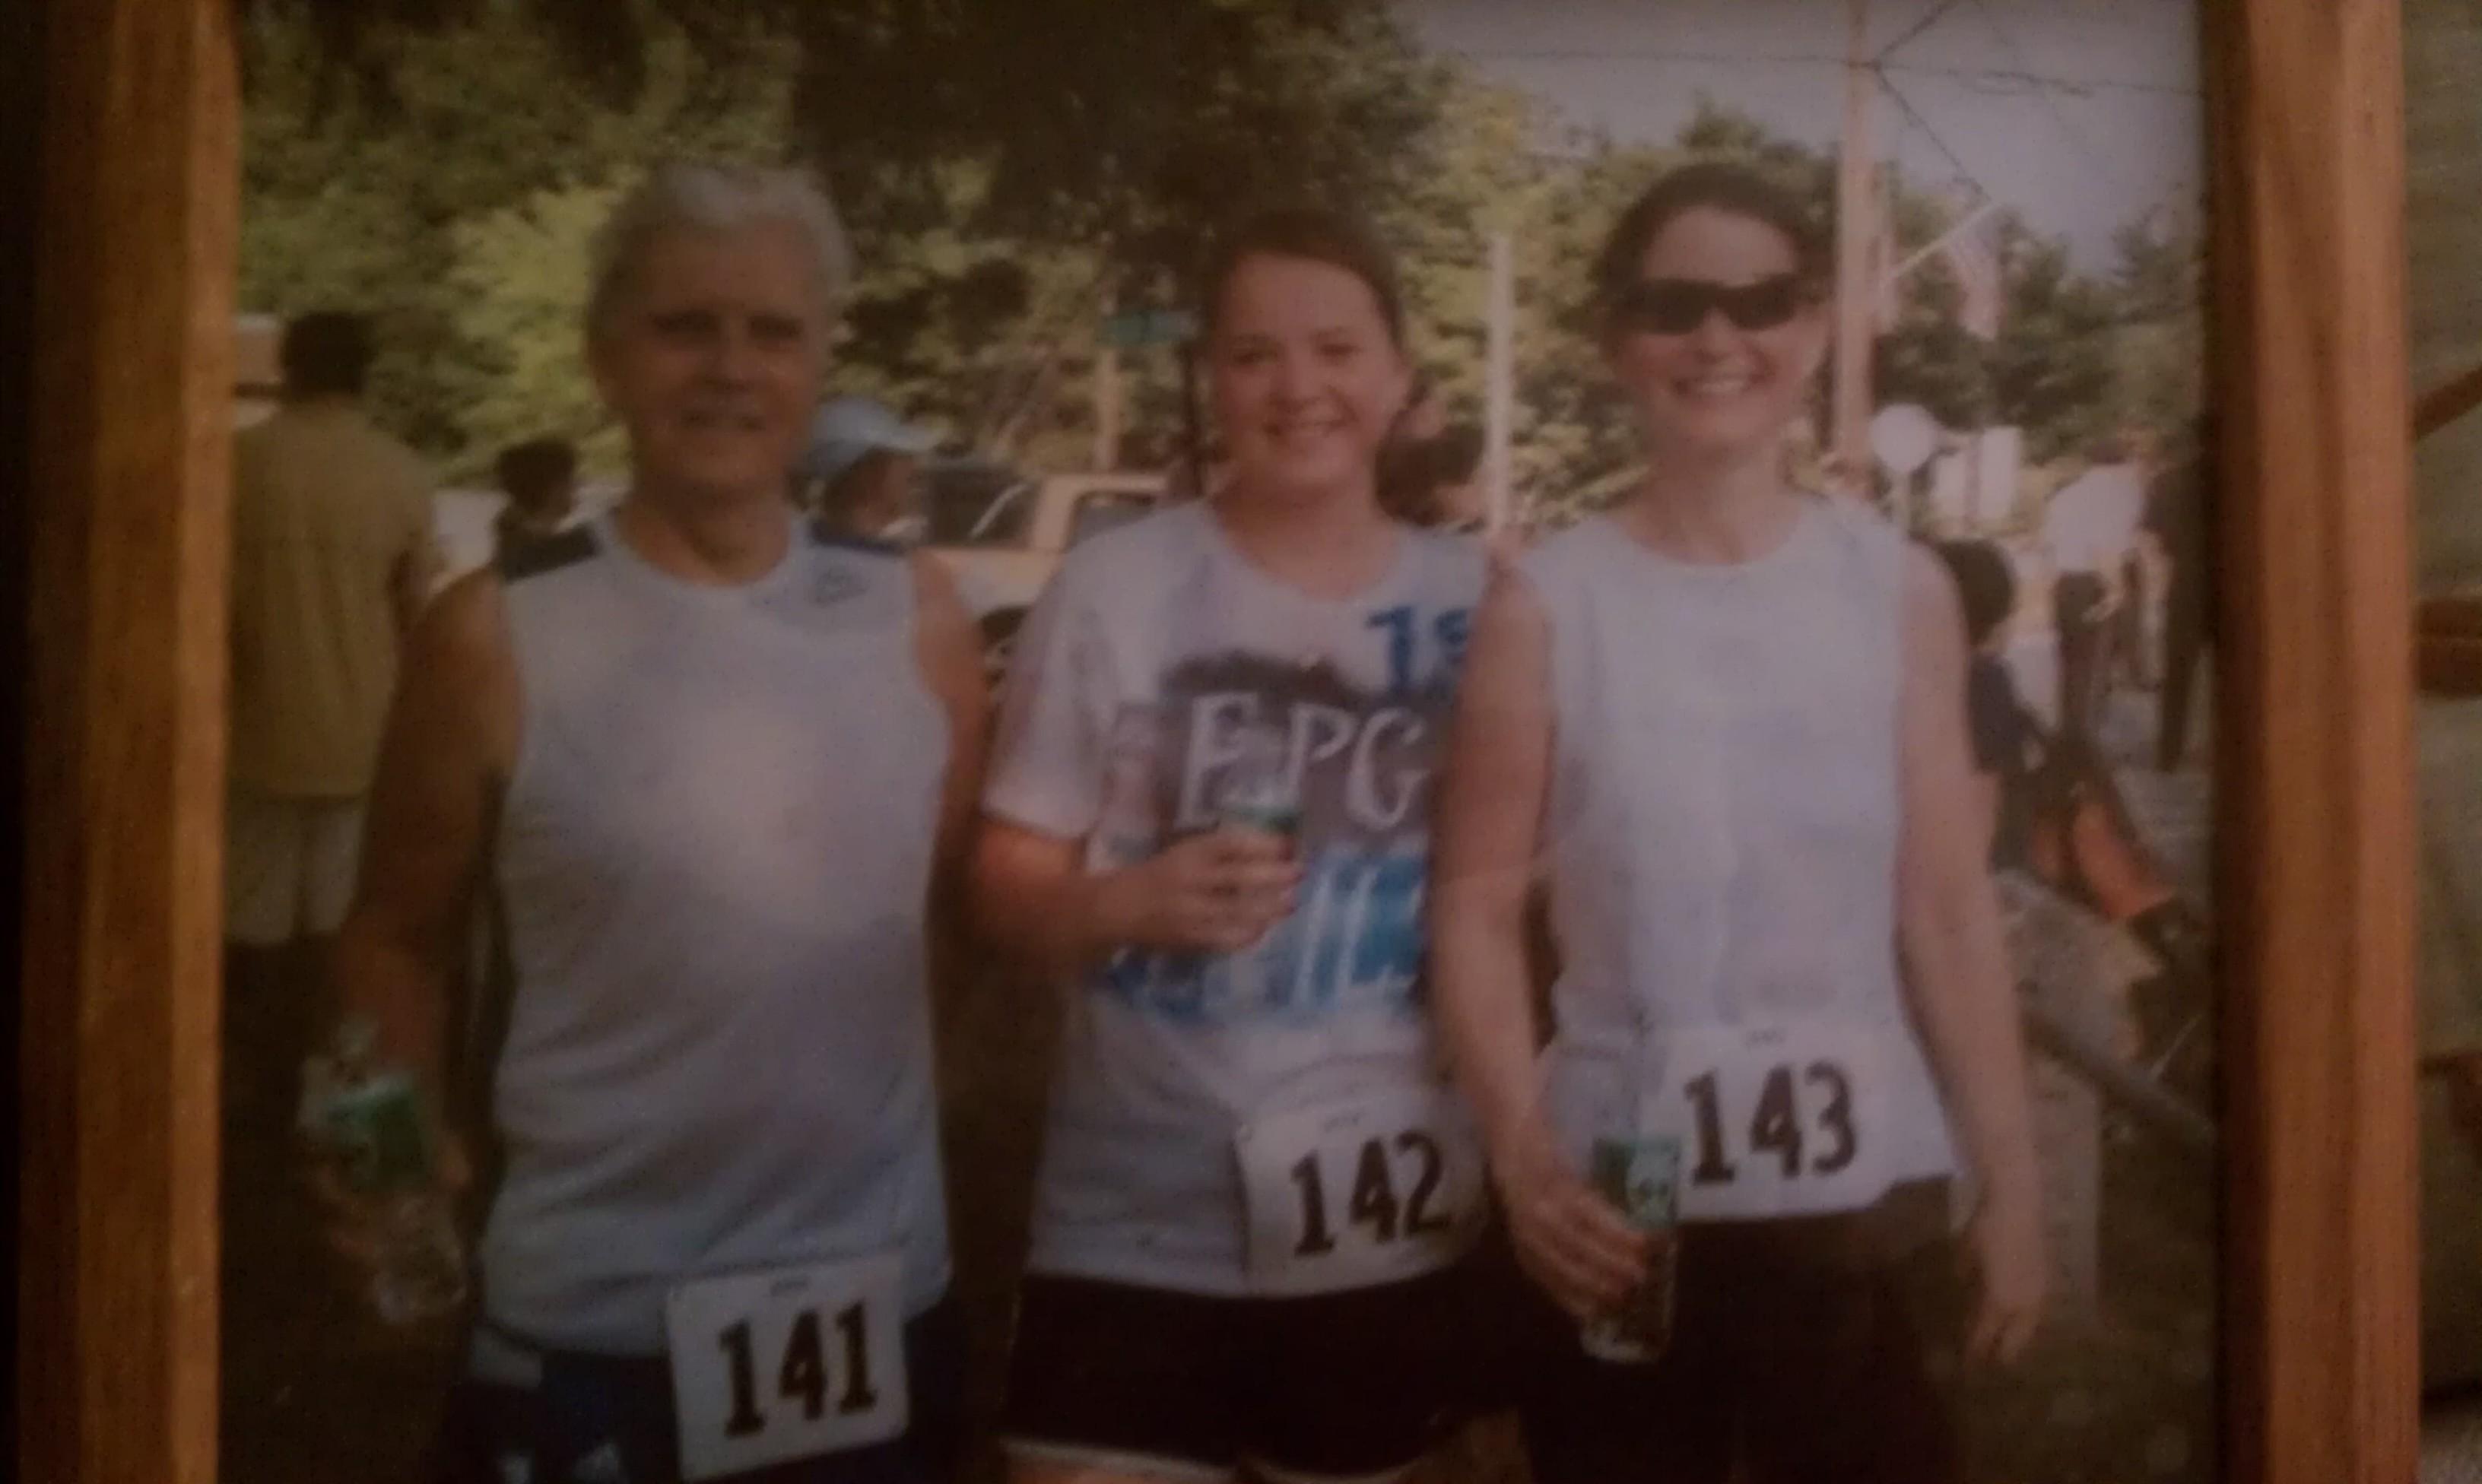 Three Generations of Runners!